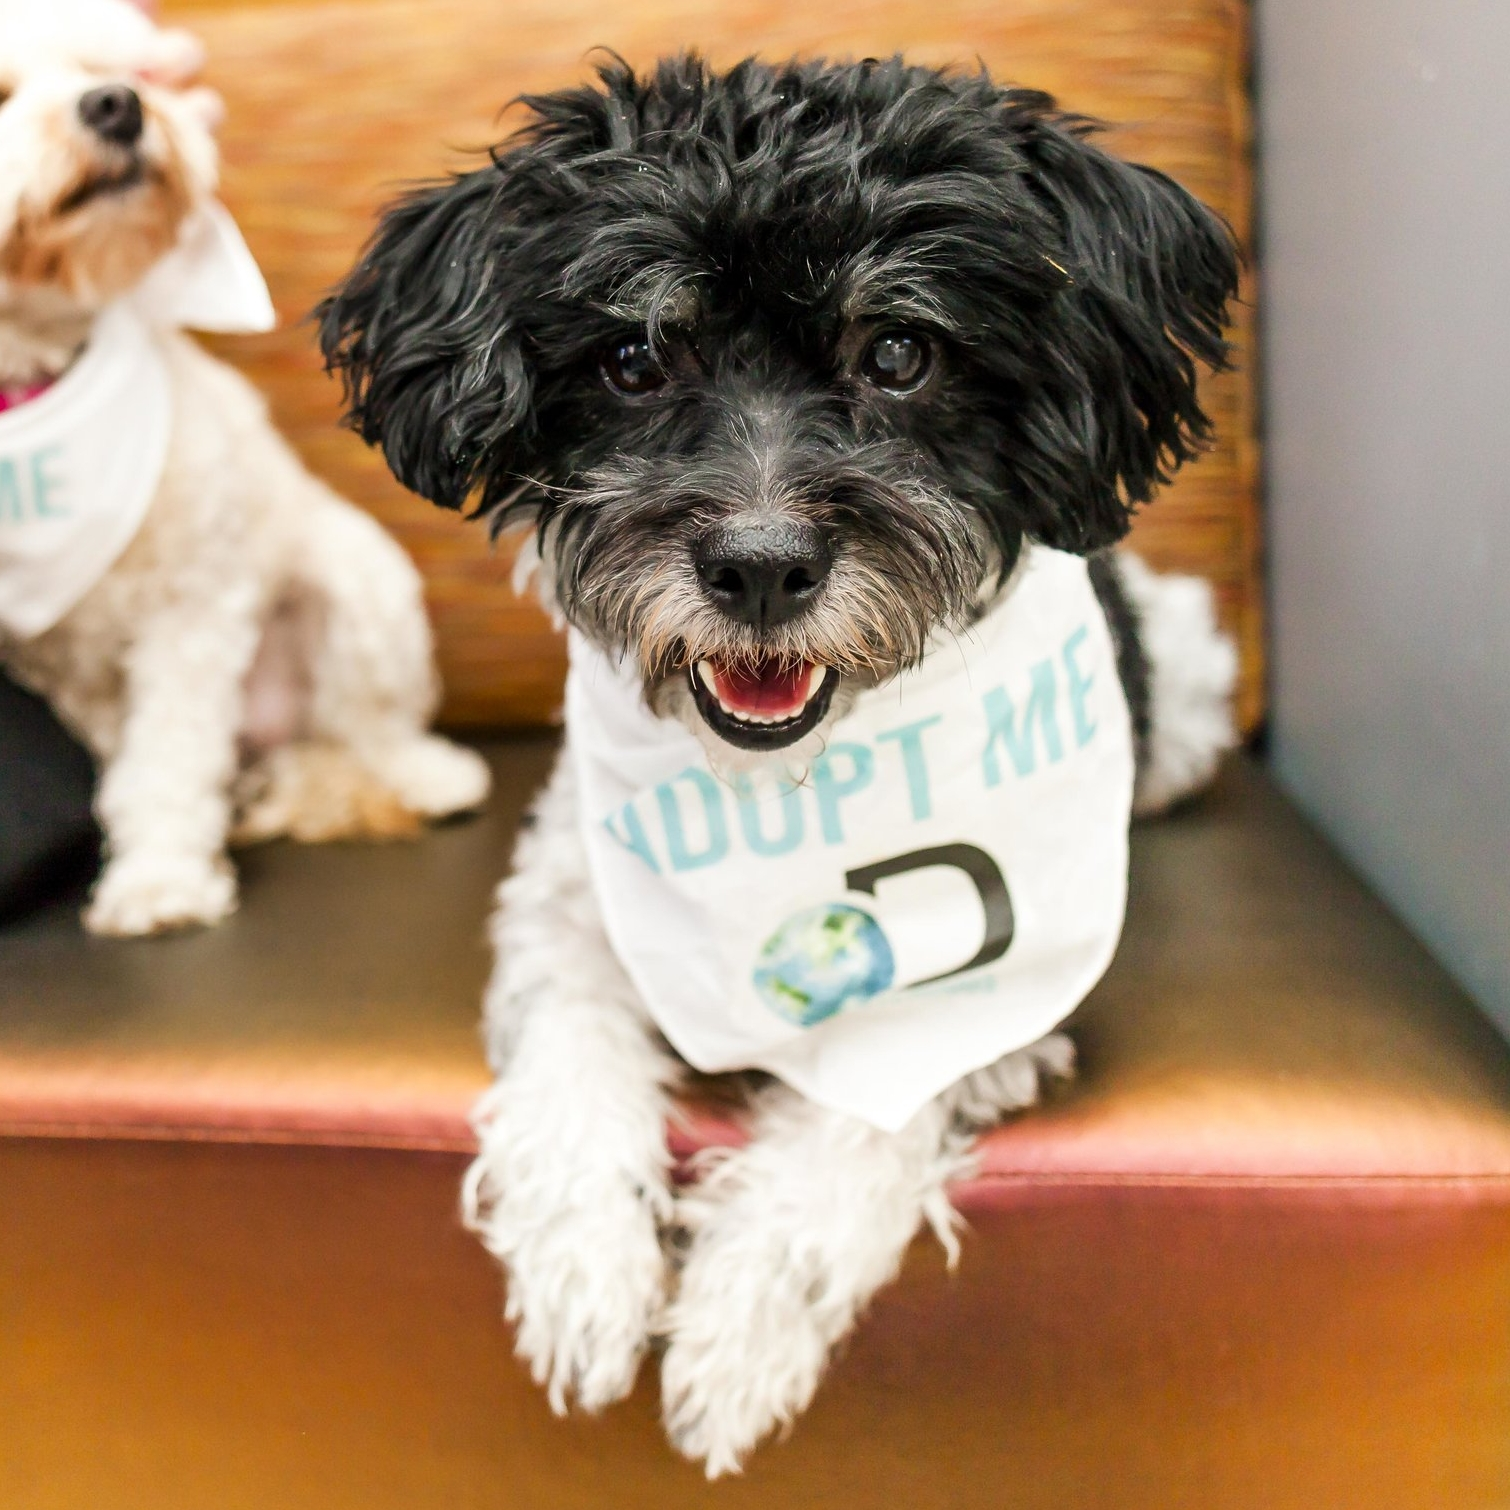 Cookie - Twenty Paws Rescue